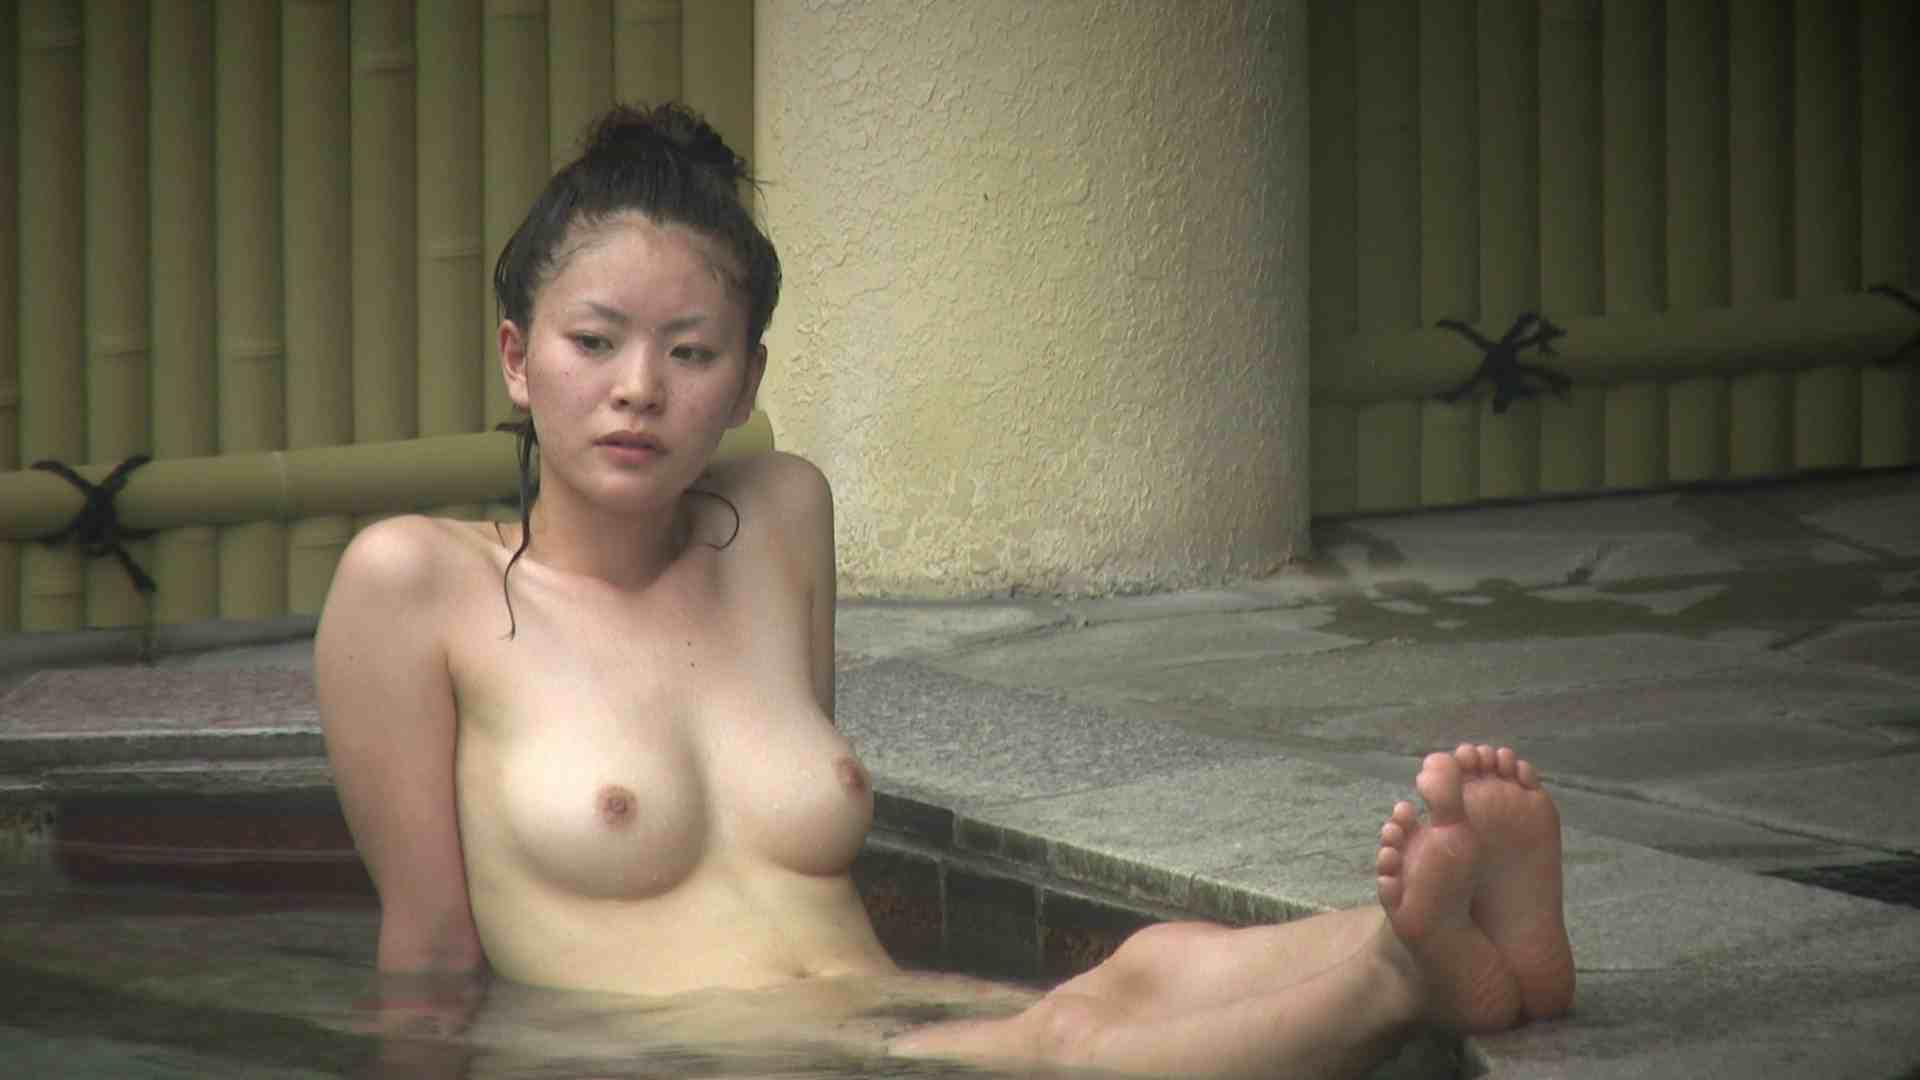 Aquaな露天風呂Vol.137 HなOL ヌード画像 92pic 82